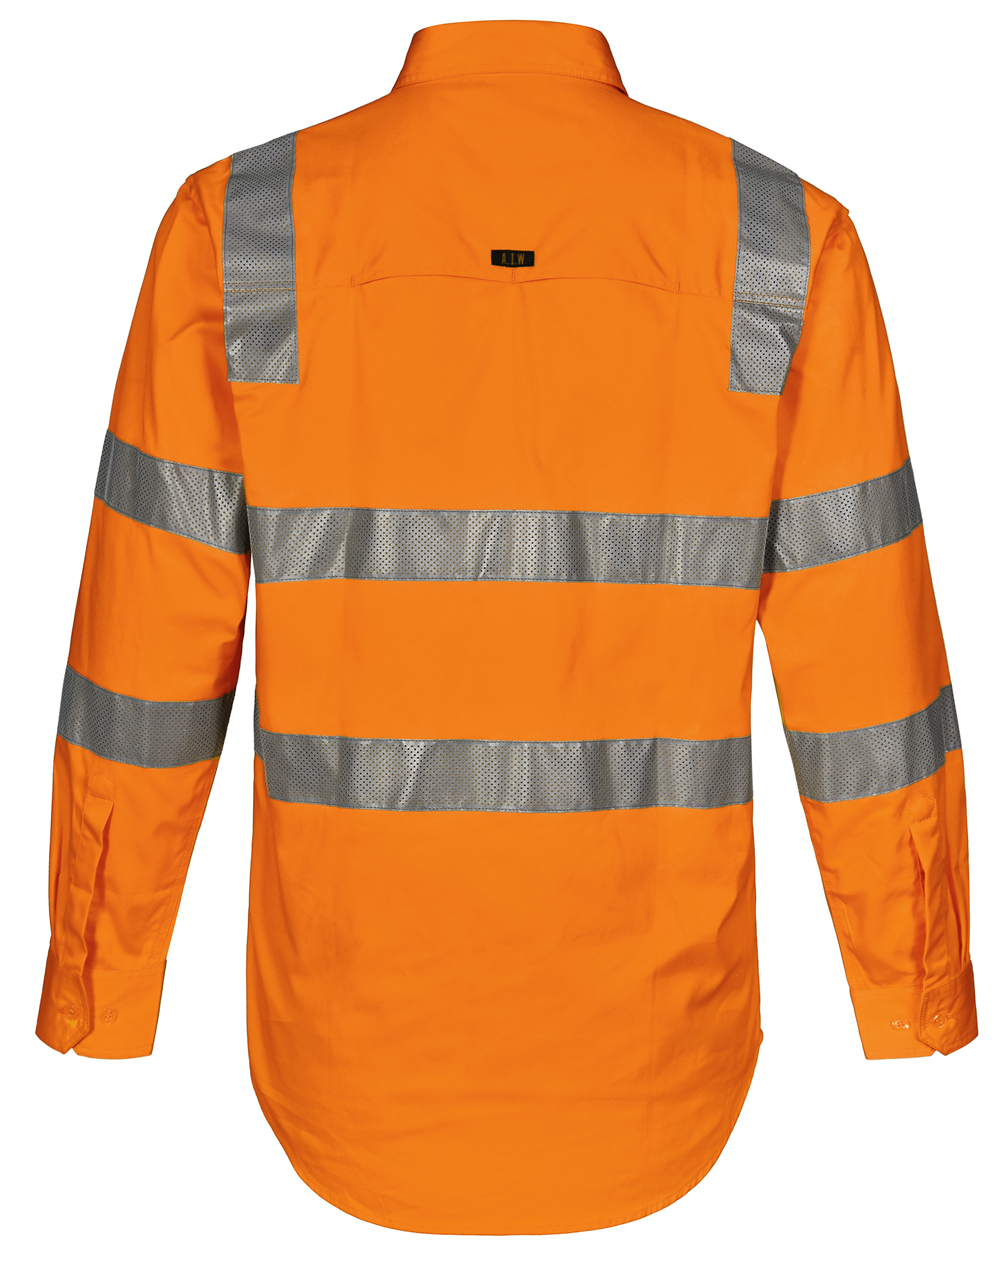 SW55 VIC Rail Lightweight Safety Shirt- Unisex